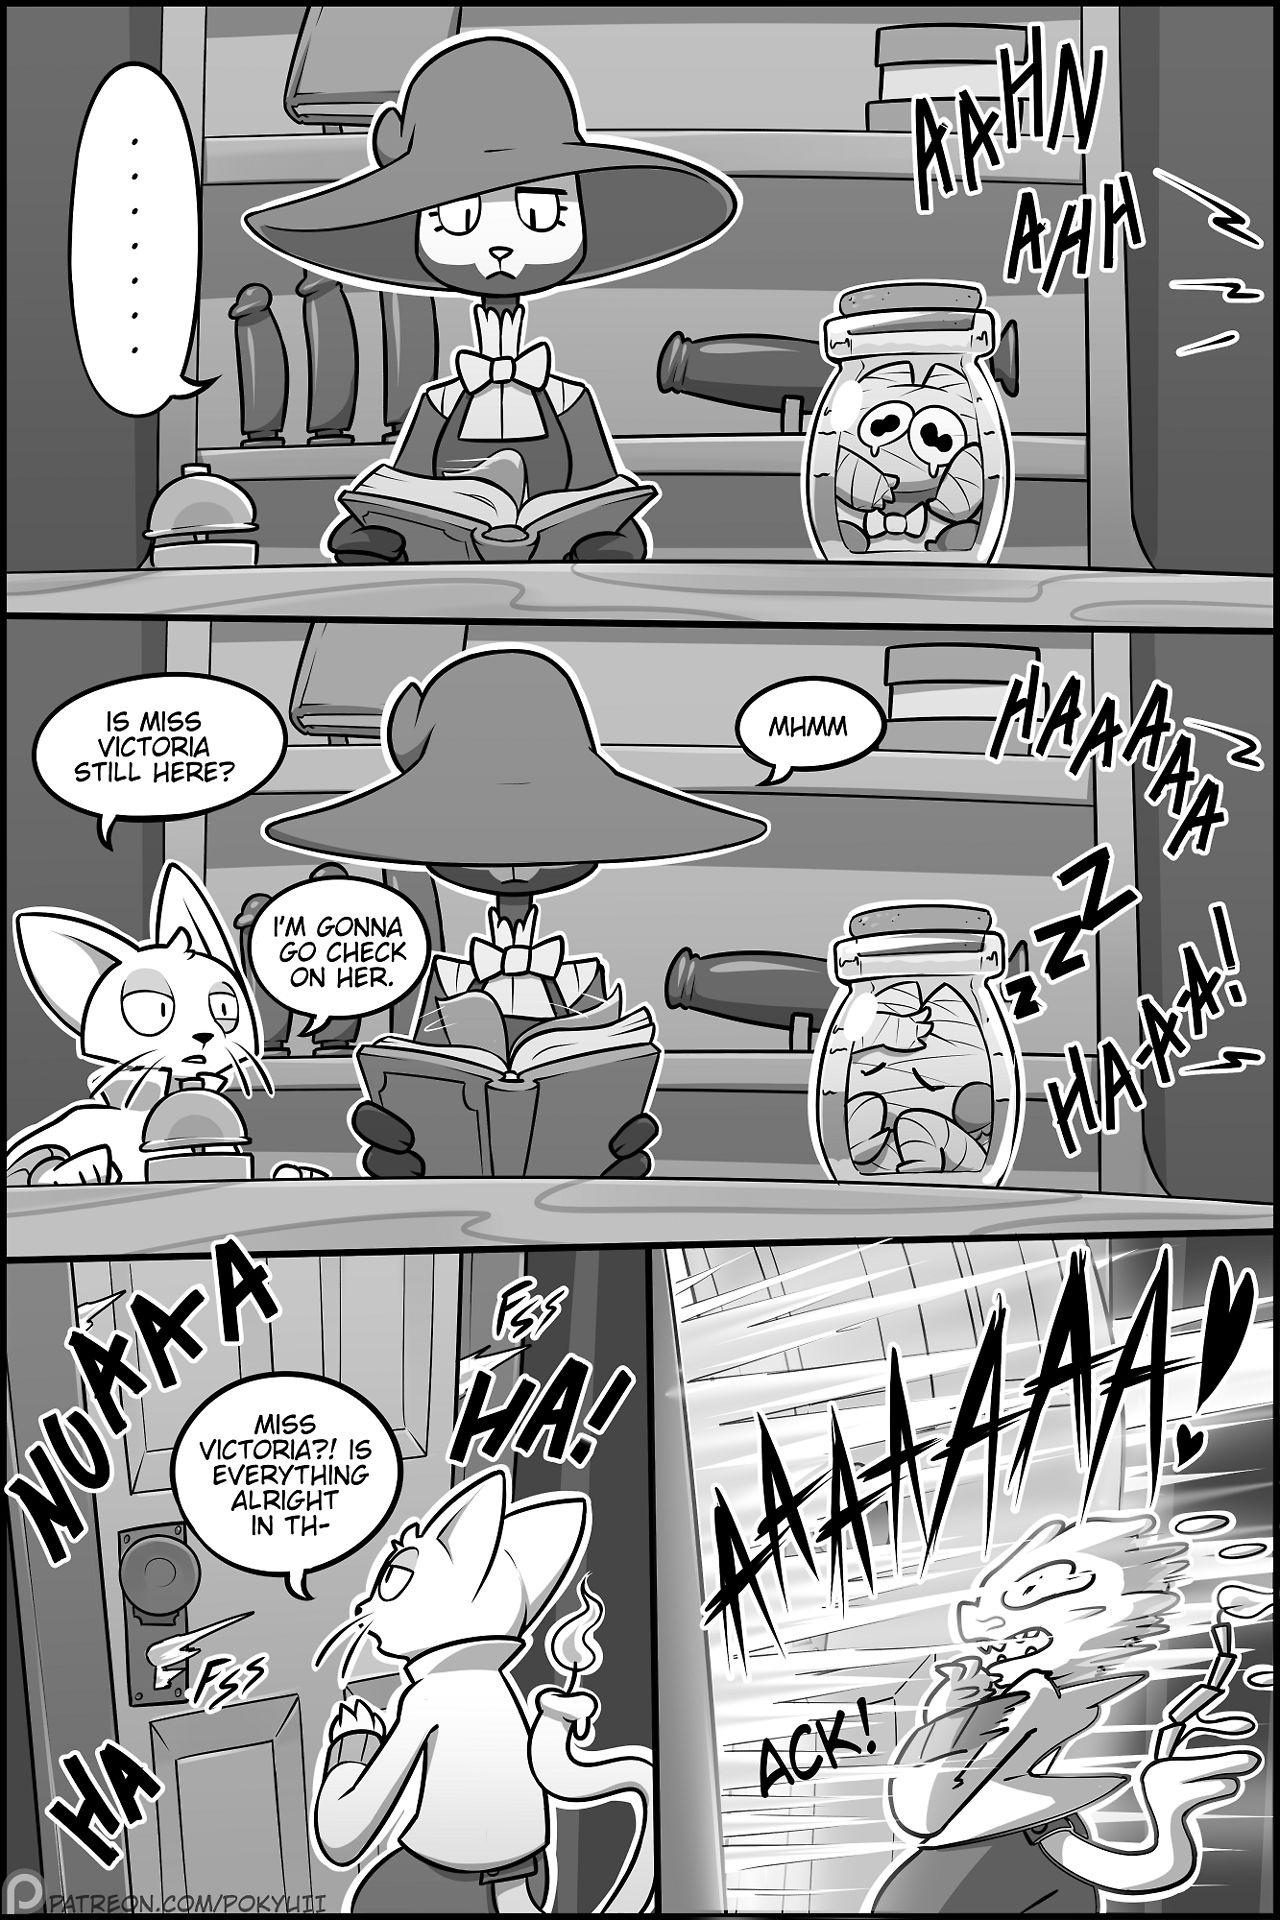 Starhell Magic Erotica porn comics Masturbation, Fantasy, Furry, Futanari, Sex and Magic, Sex Toys